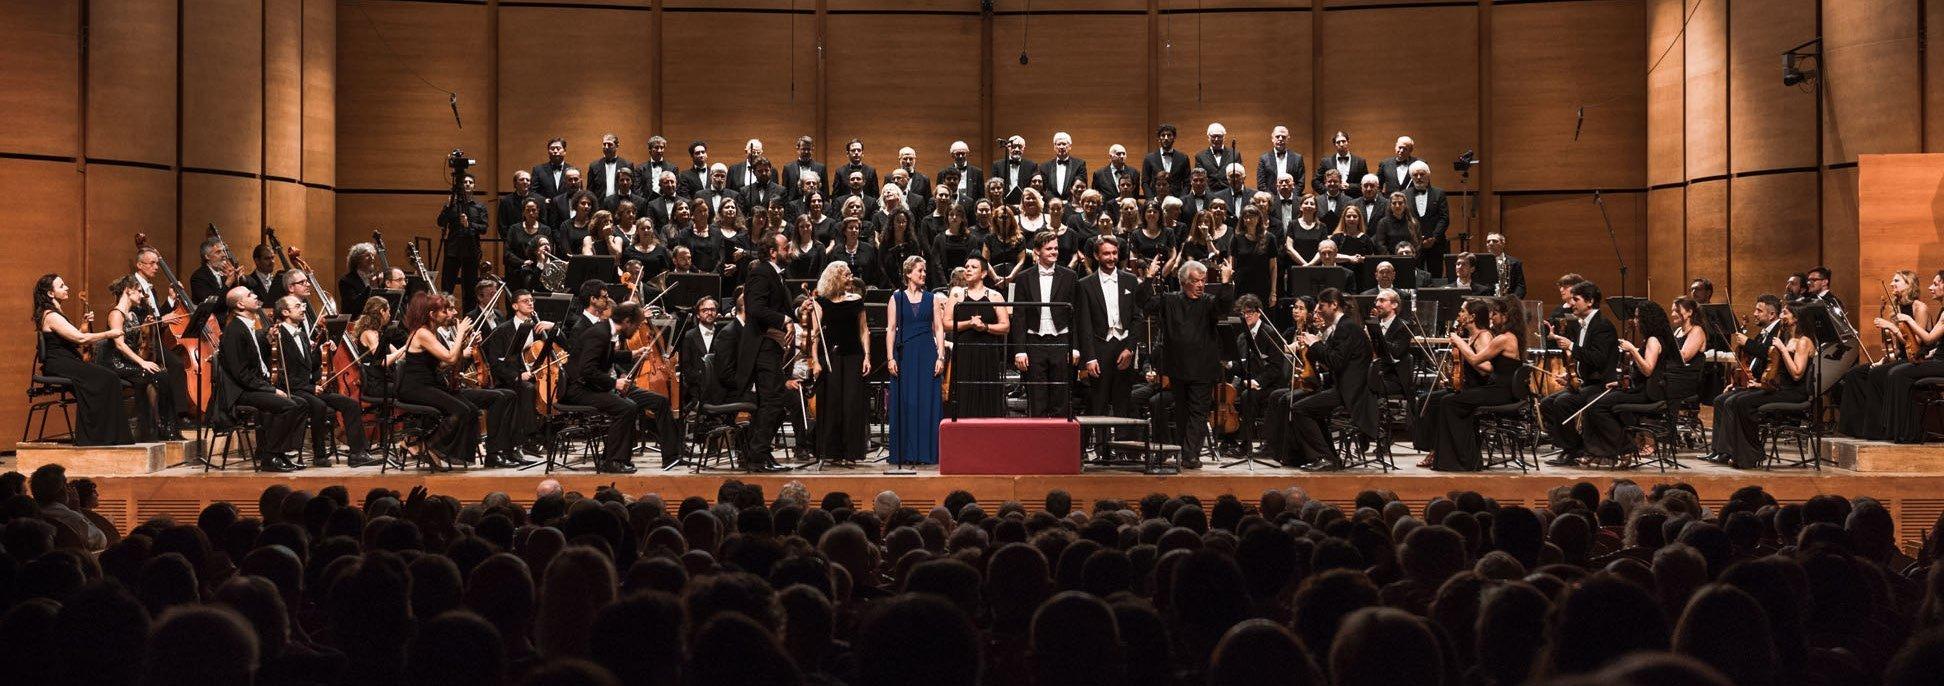 L'Orchestra Sinfonica di Milano Giuseppe Verdi